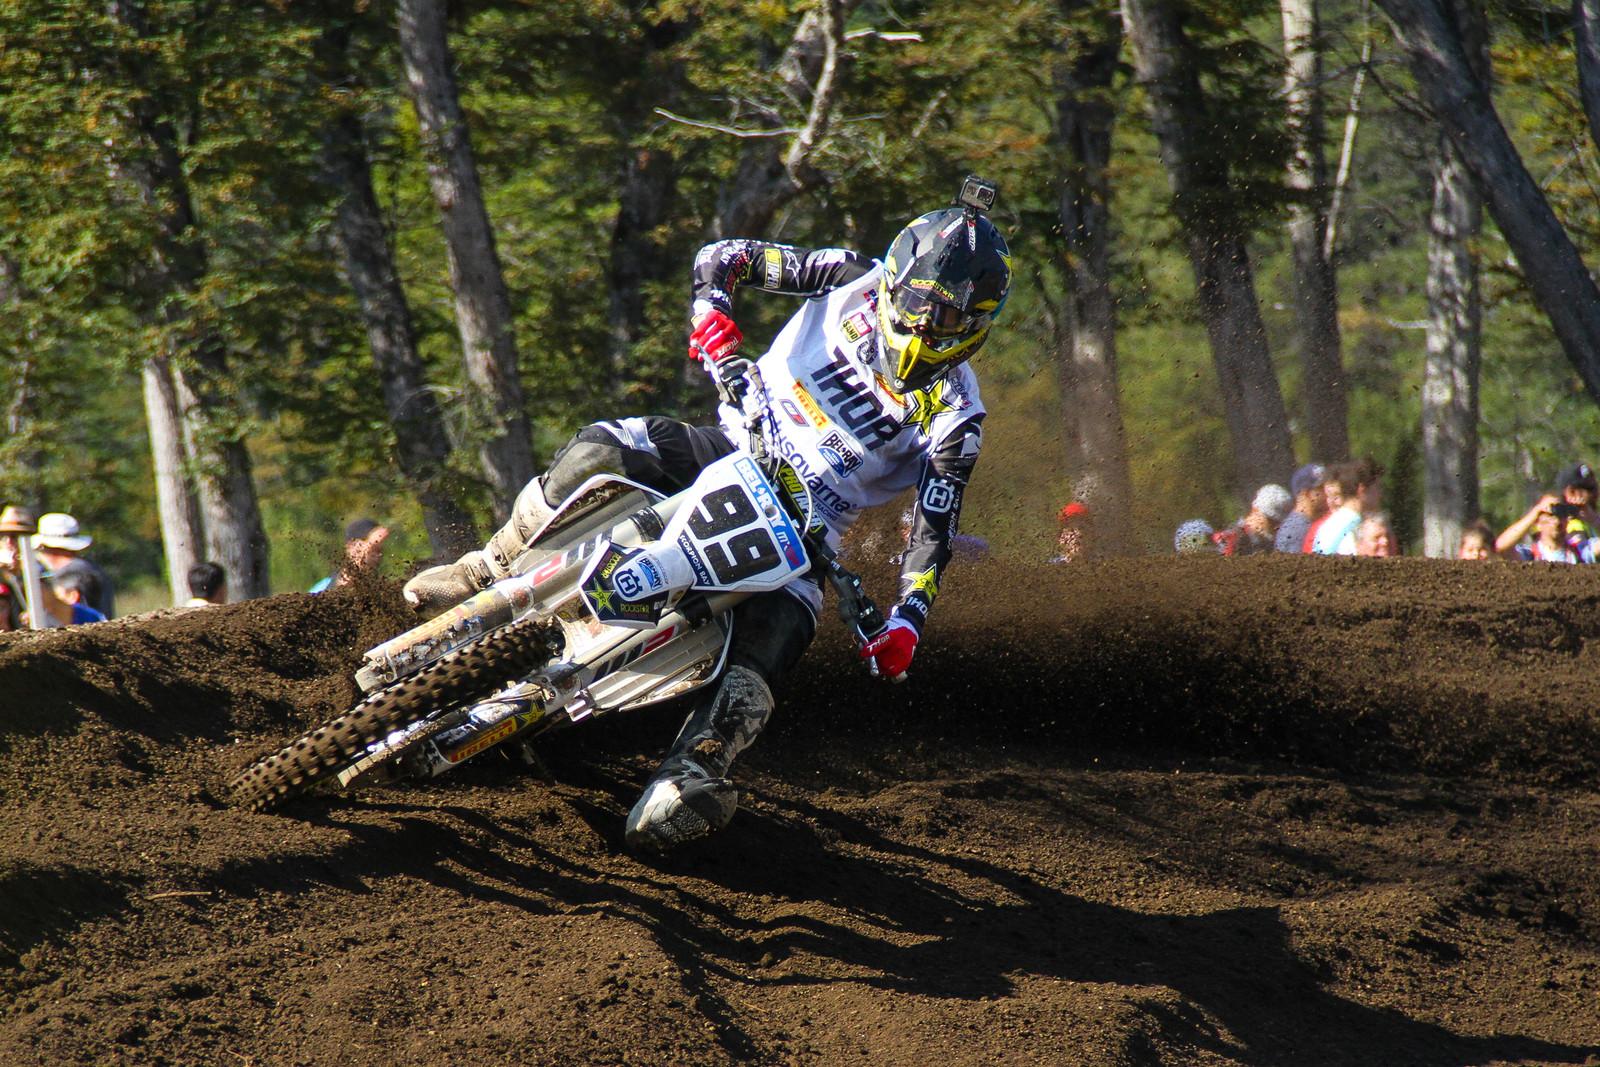 Max Anstie - Photo Blast: 2017 MXGP of Argentina - Motocross Pictures - Vital MX